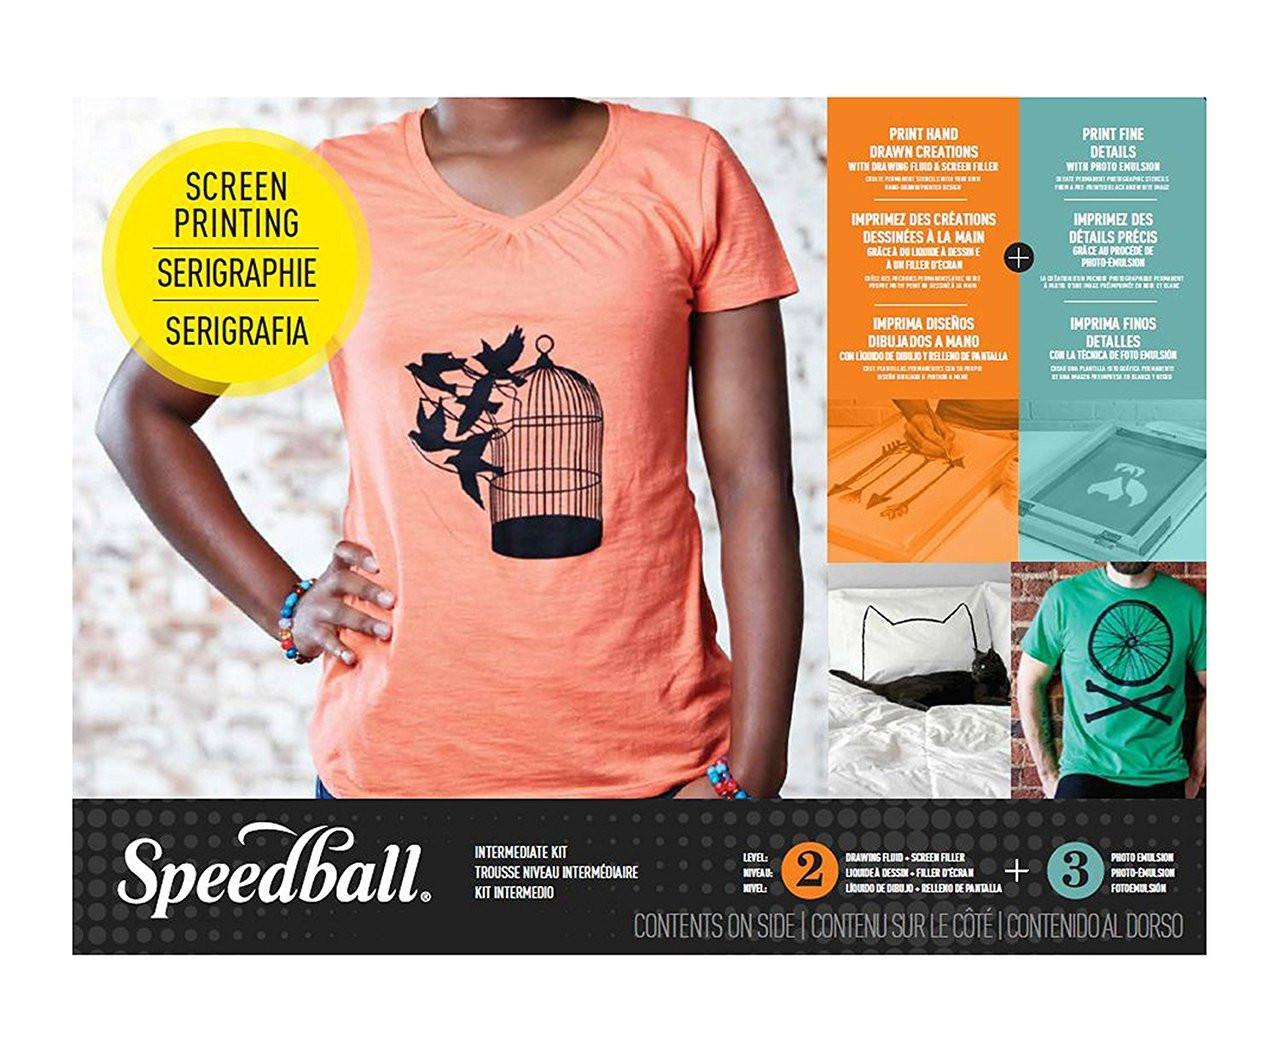 Speedball Intermediate Screen Printing Kit